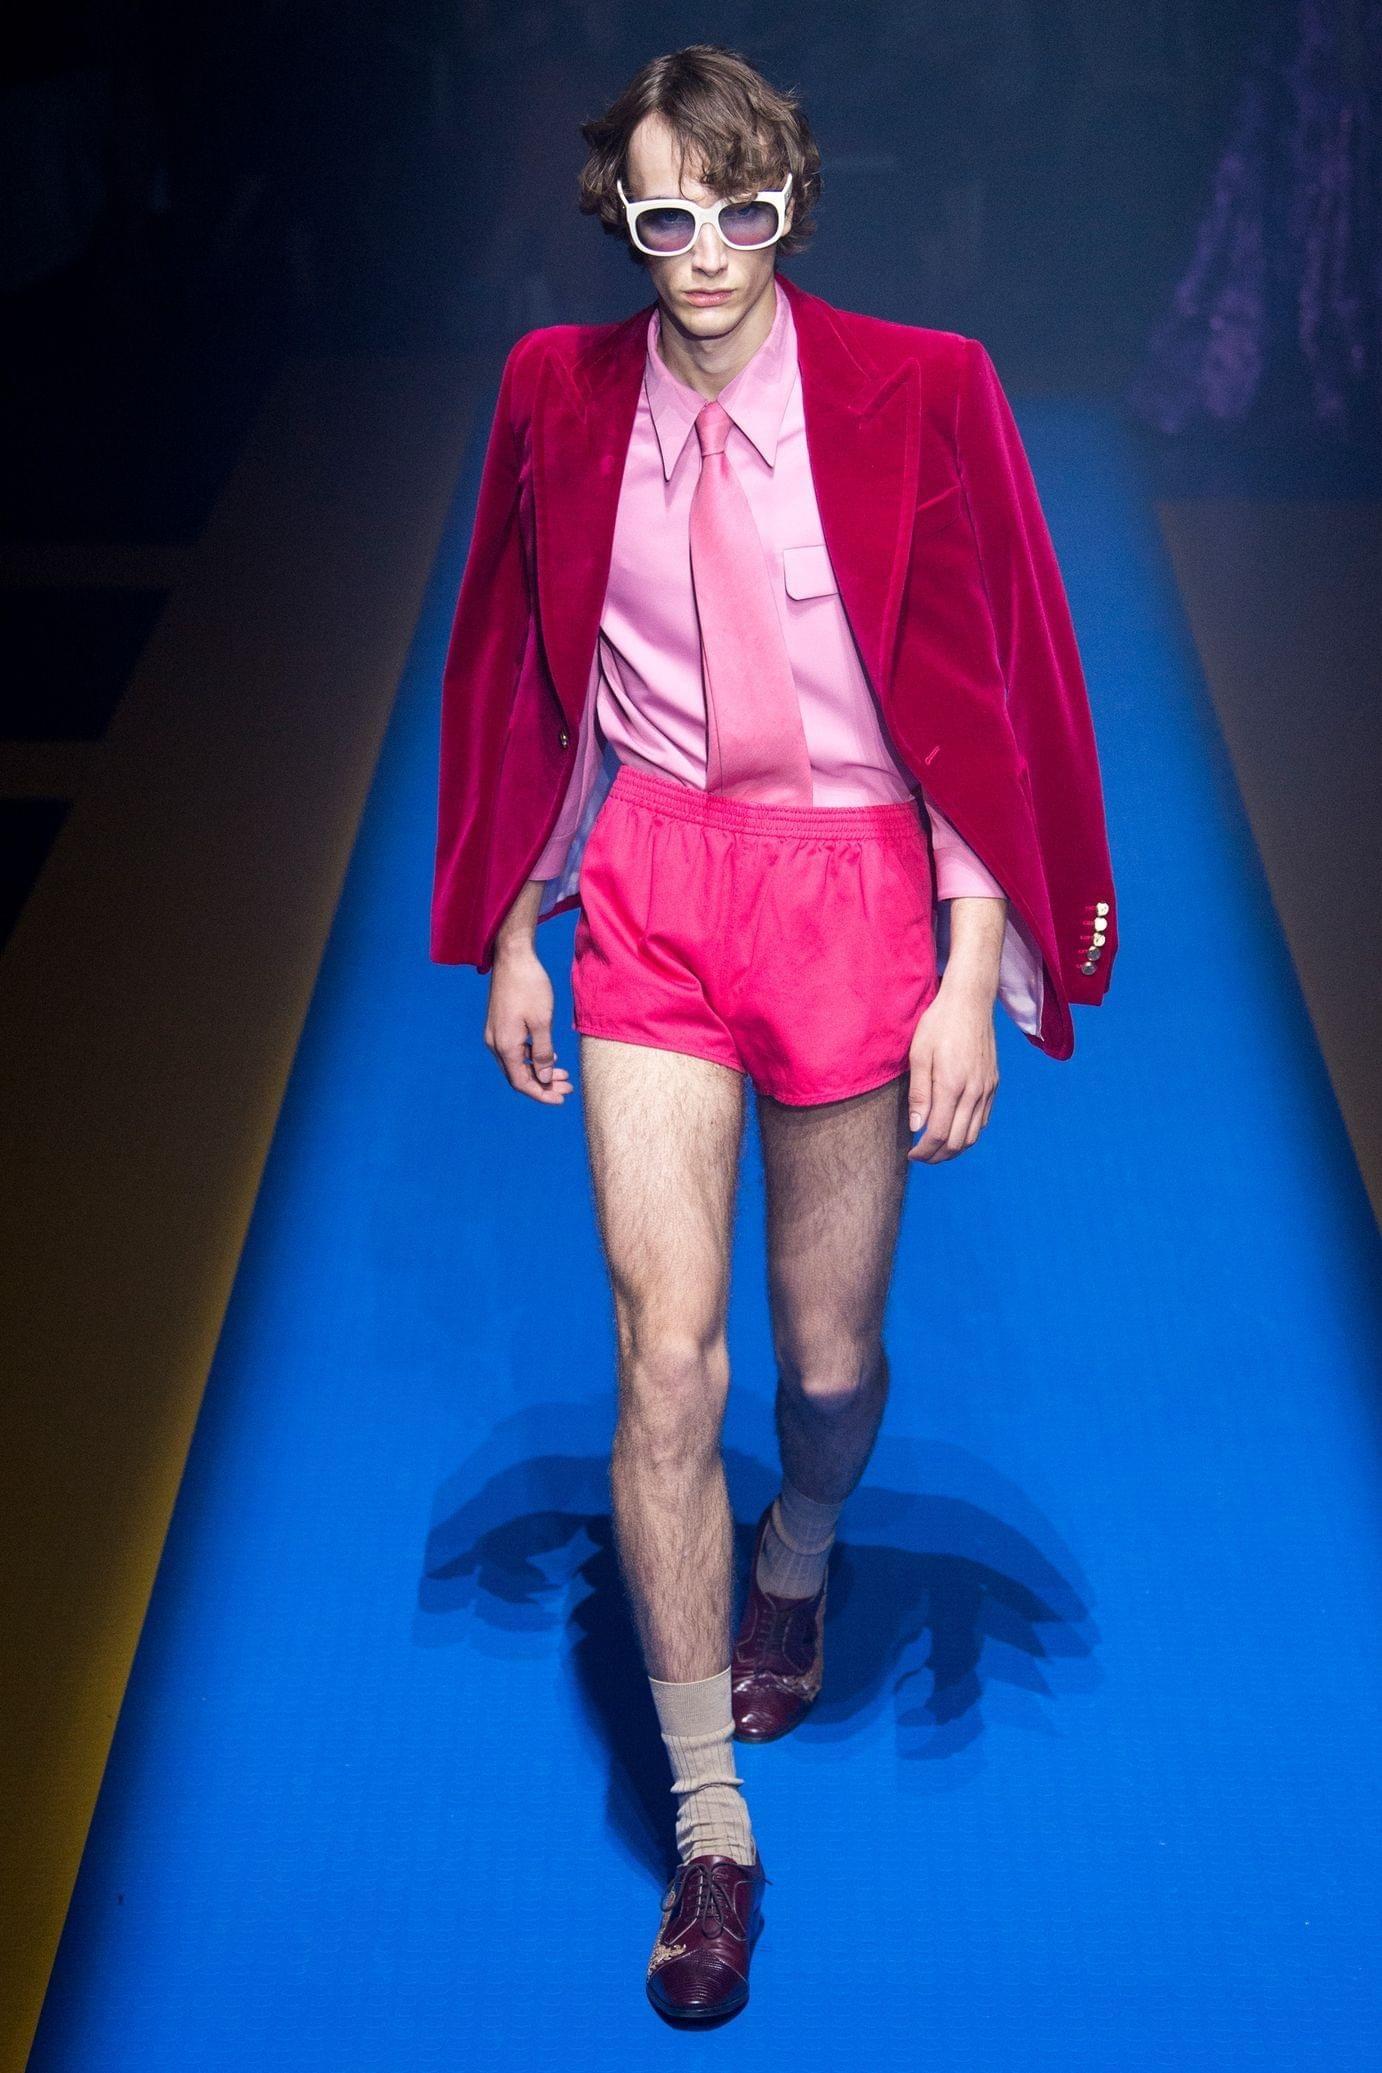 Gucci весна лето 2018 мужской розовый пиджак